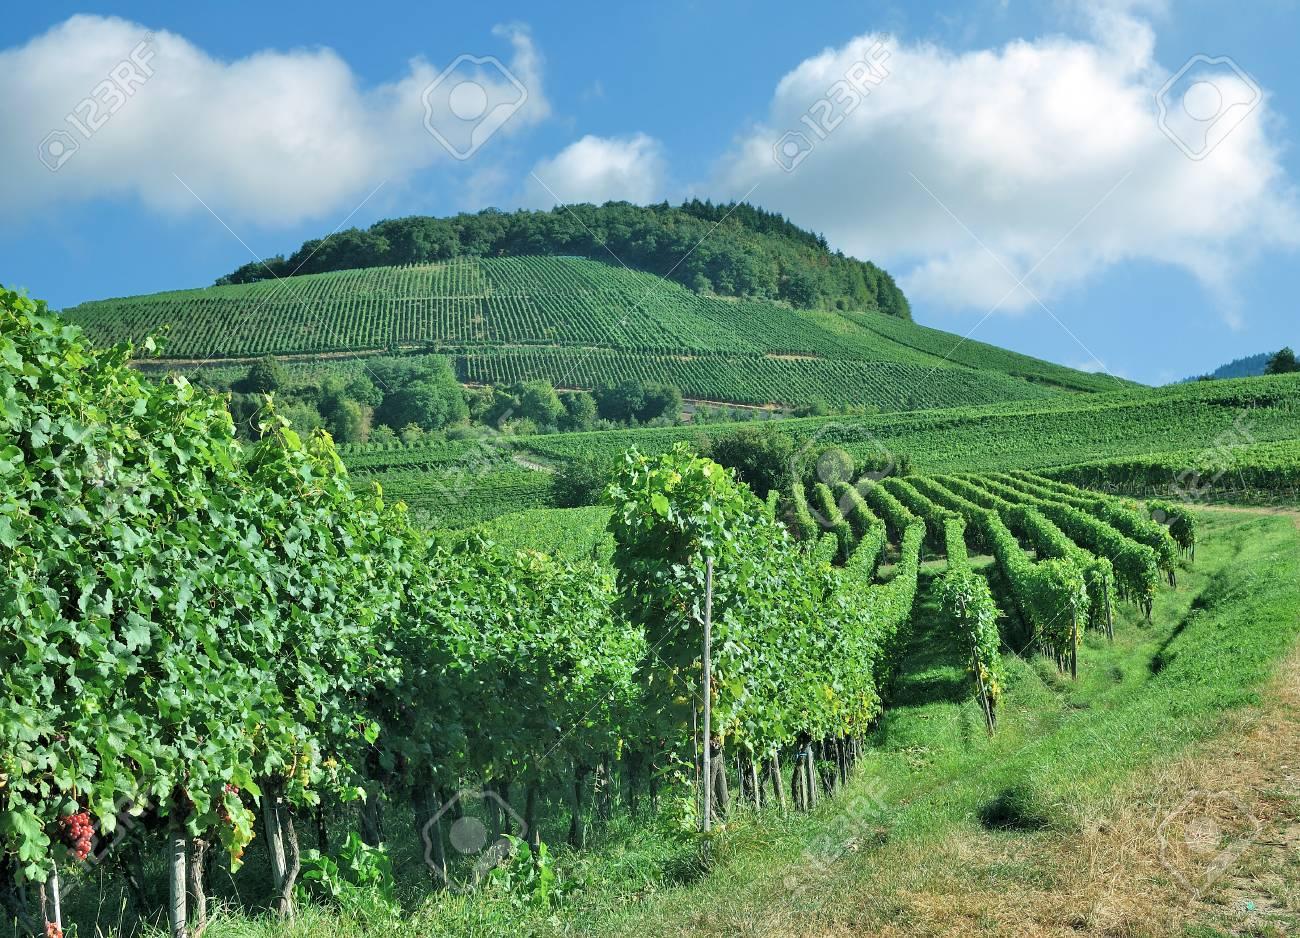 Kaiserstuhl region Landscape Black Germany Wine Vineyard Forest in ZiTOukXwP